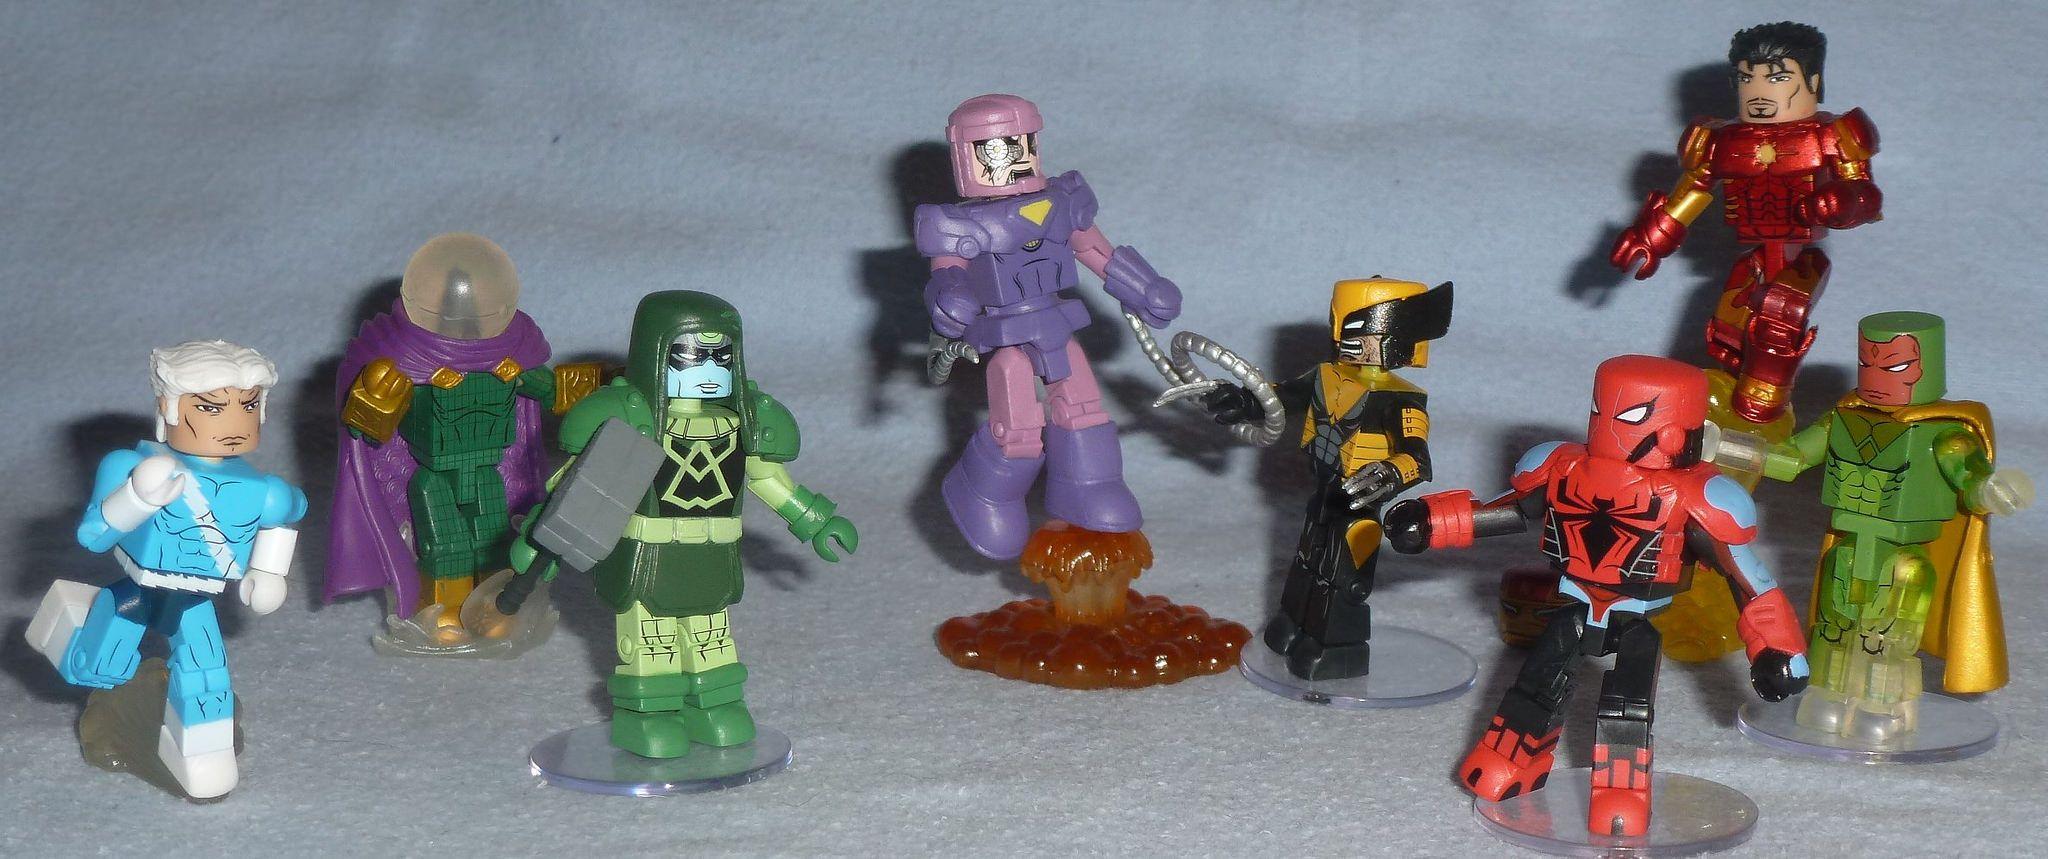 Toys & Hobbies Action Figures Marvel Minimates Tru Toys R Us Wave 2 Green Goblin